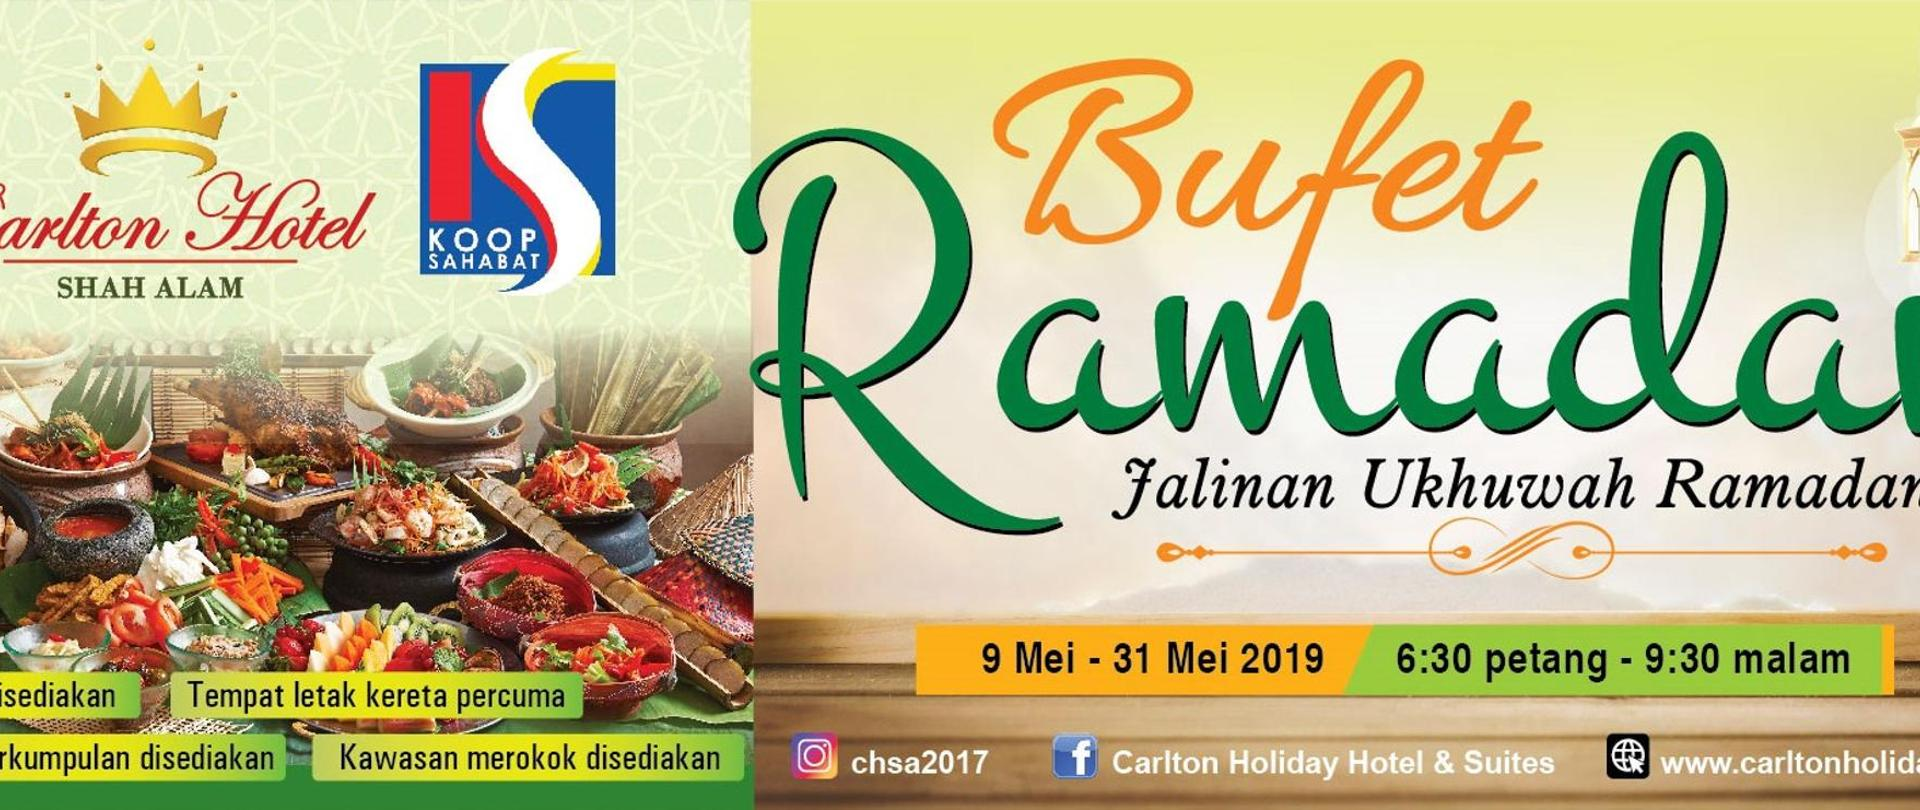 Carlton_Ramadan_Banner (2).jpg